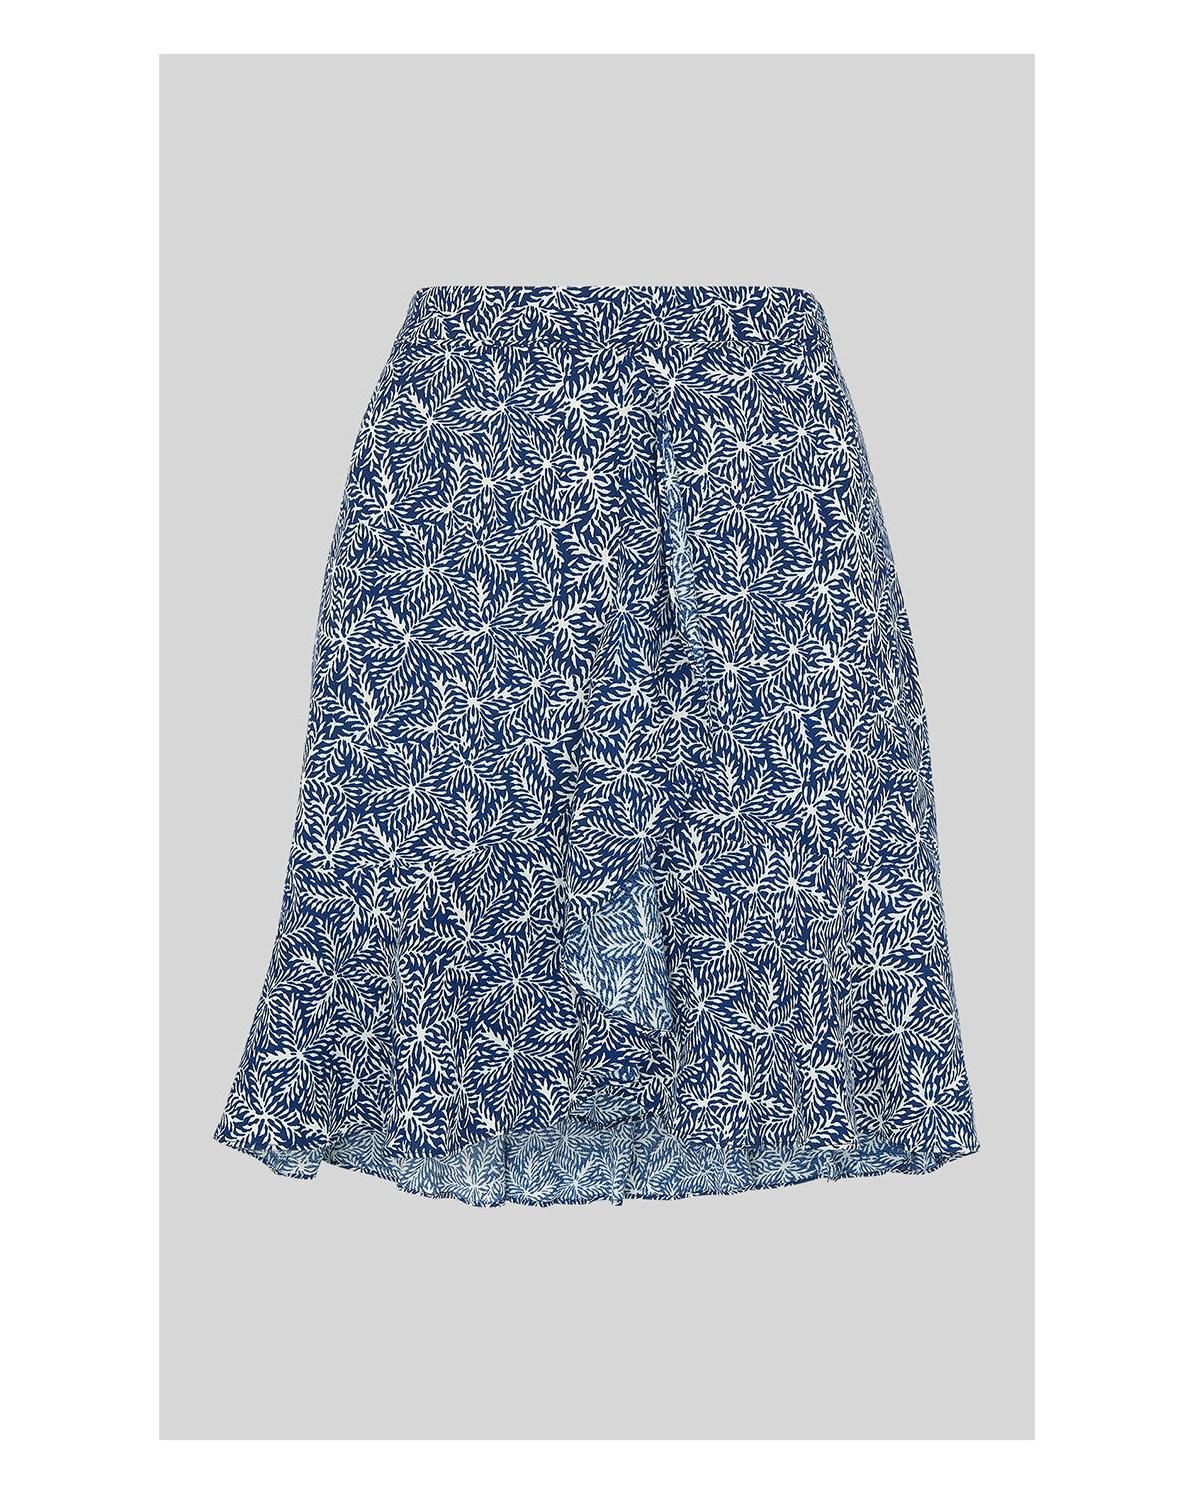 74ea9942aea Etched Print Mini Skirt